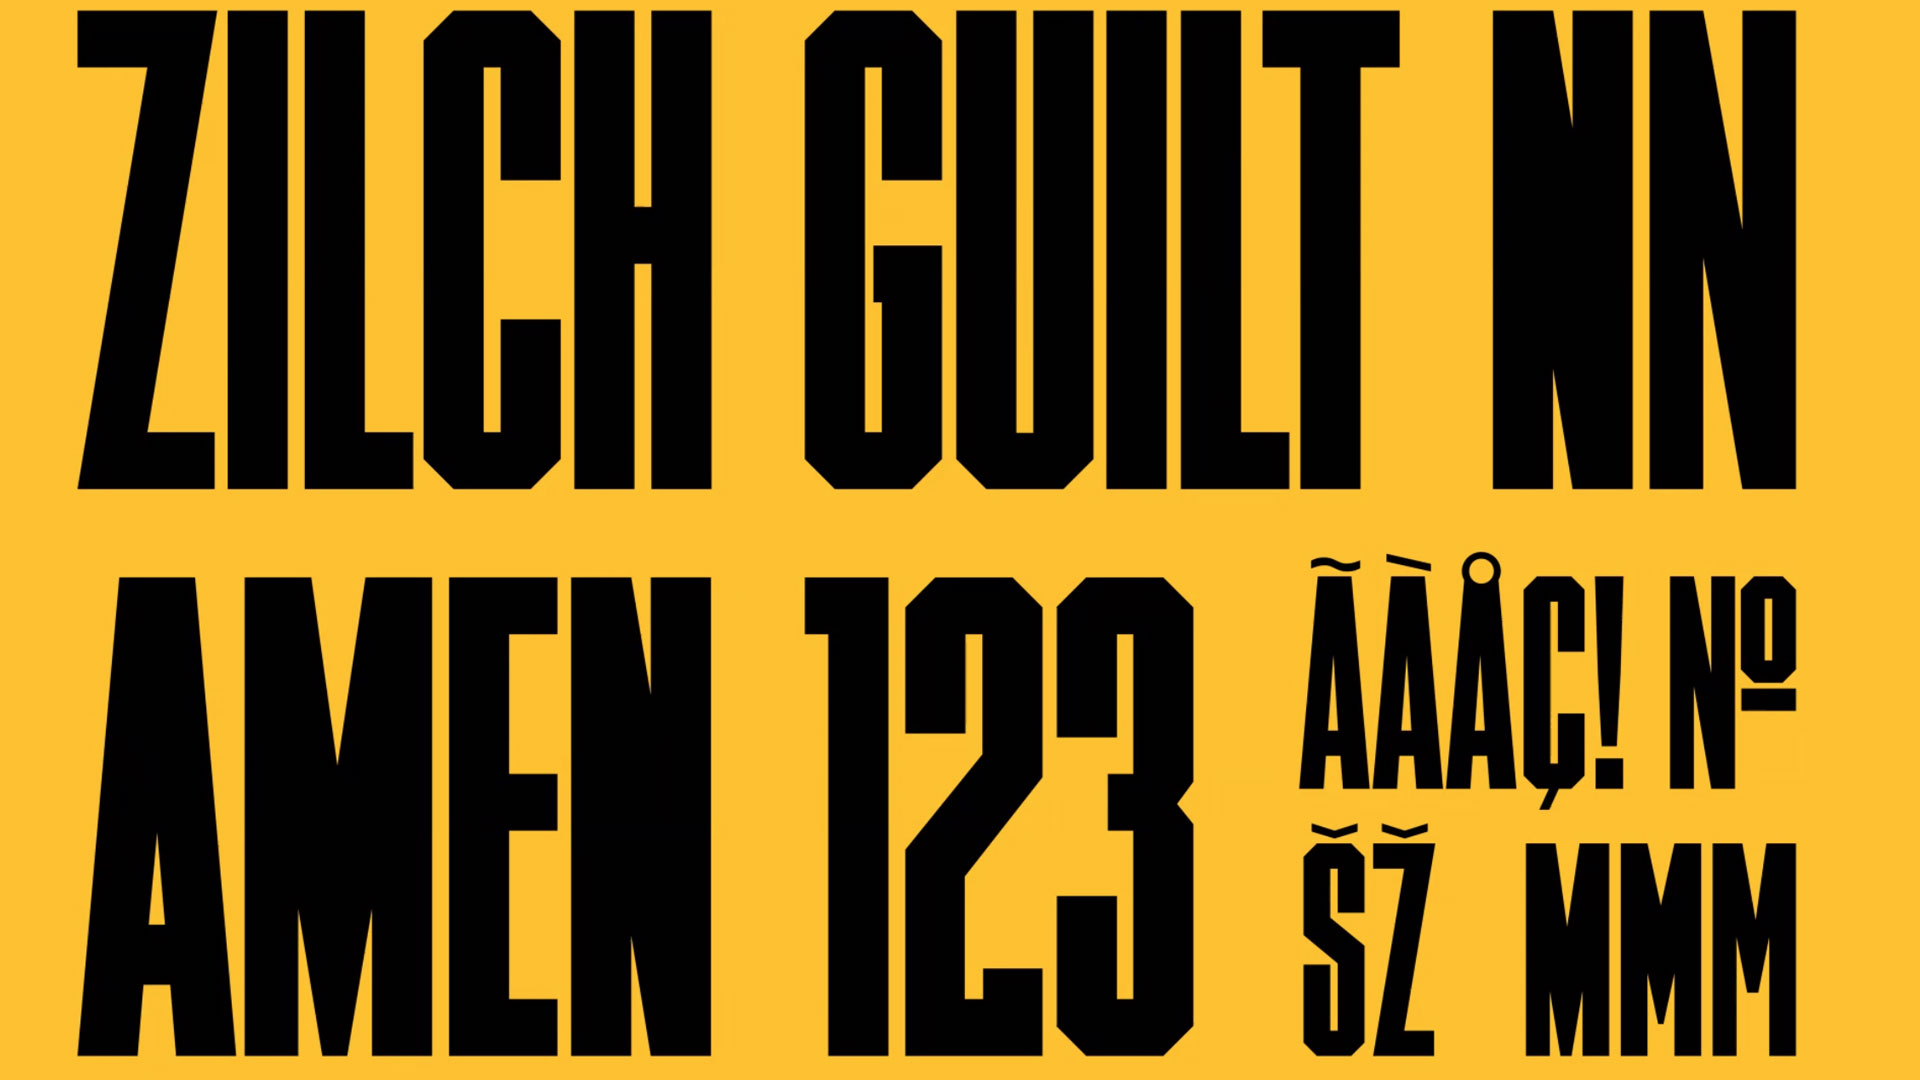 type sample zilch guilt nn